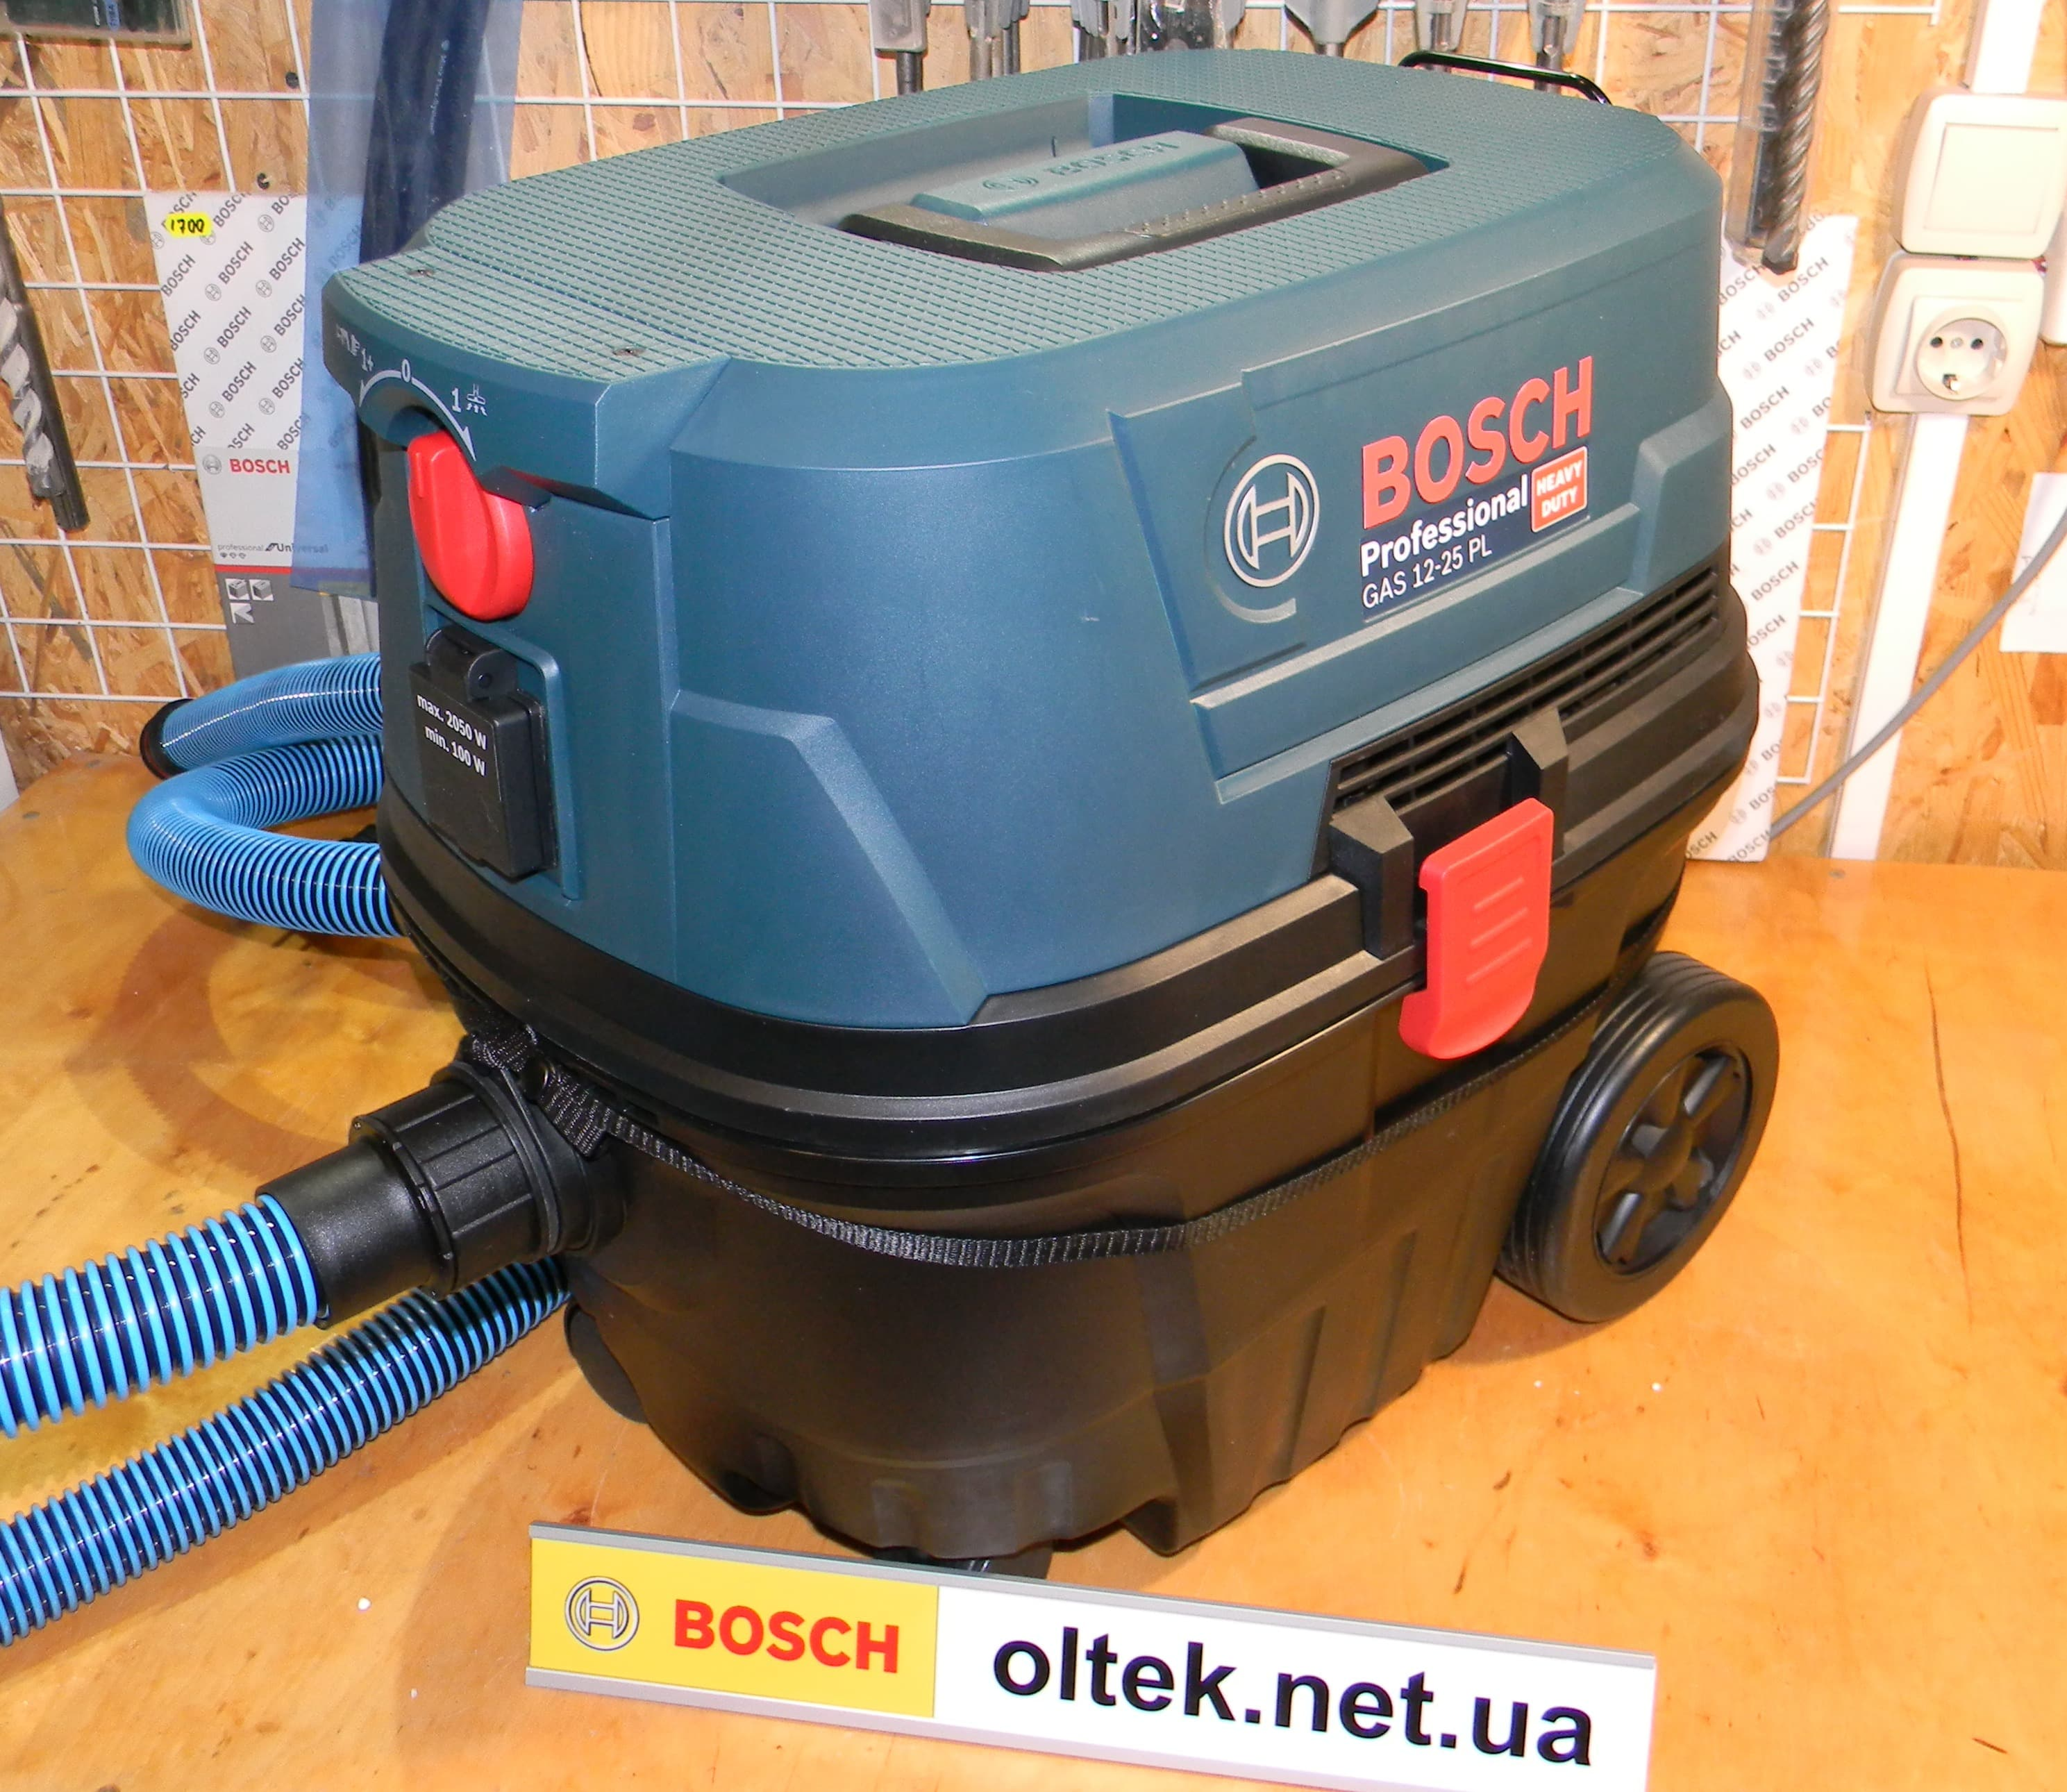 Bosch-GAS-12-25